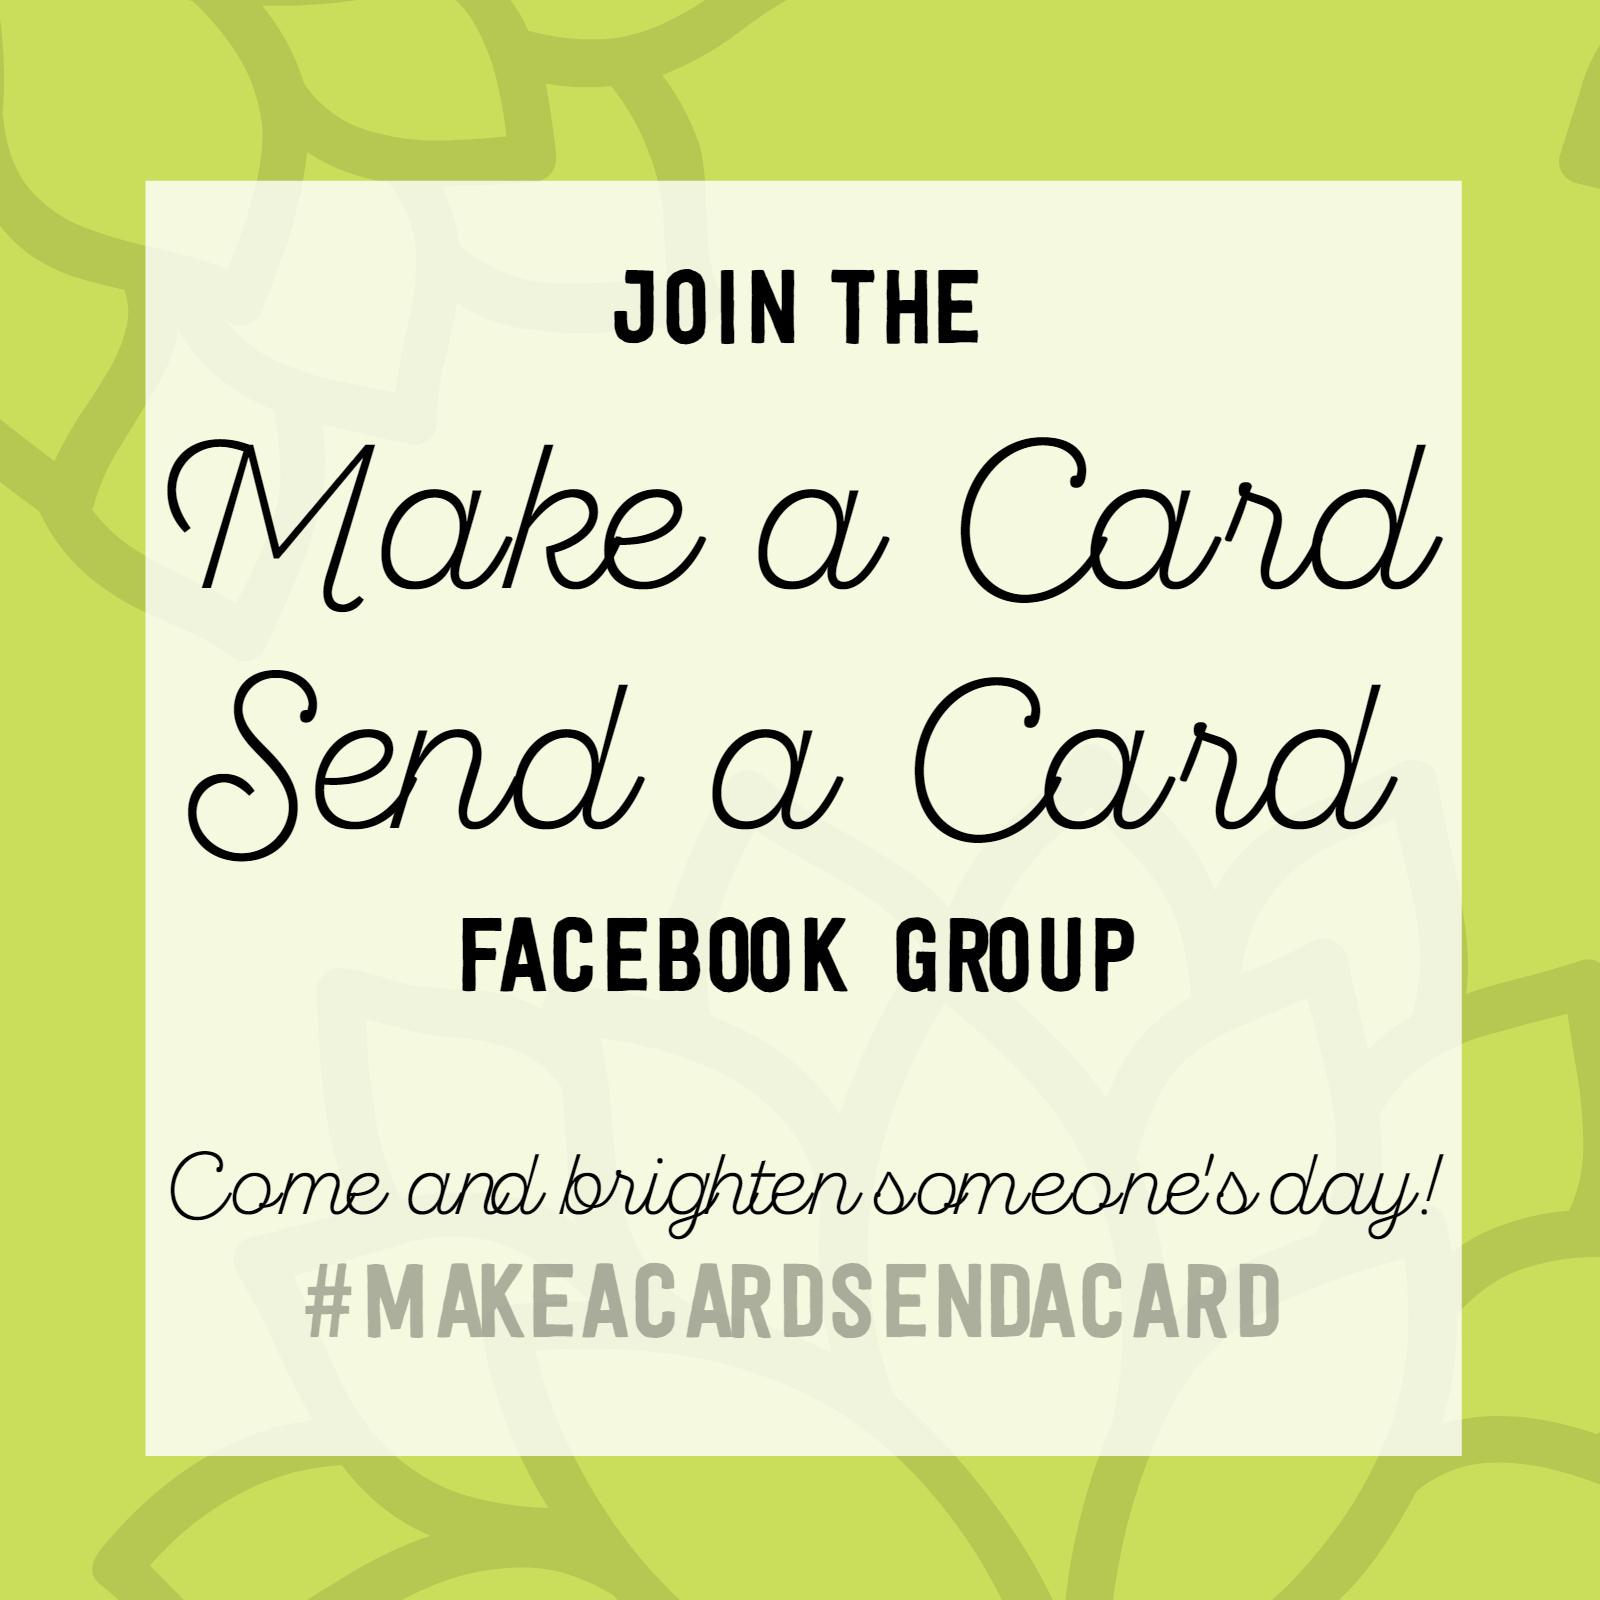 Make a Card Send a Card Facebook Group